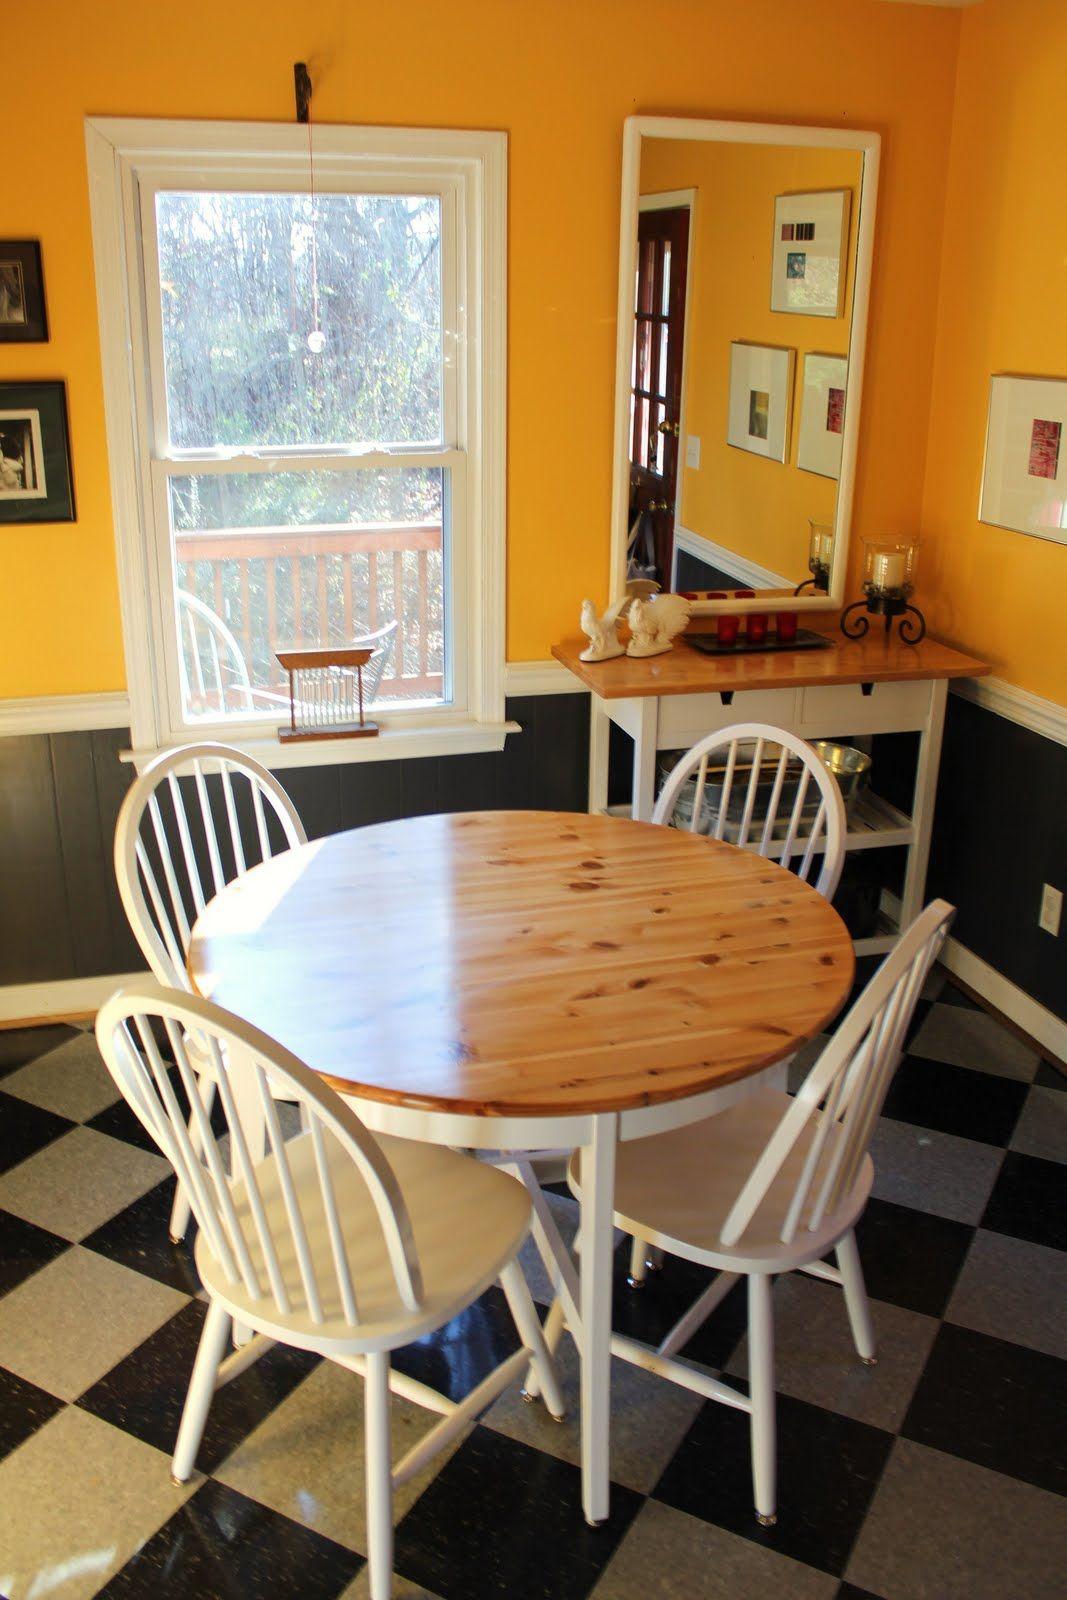 staining ikea table tops  Идеи для дома Для дома Дом